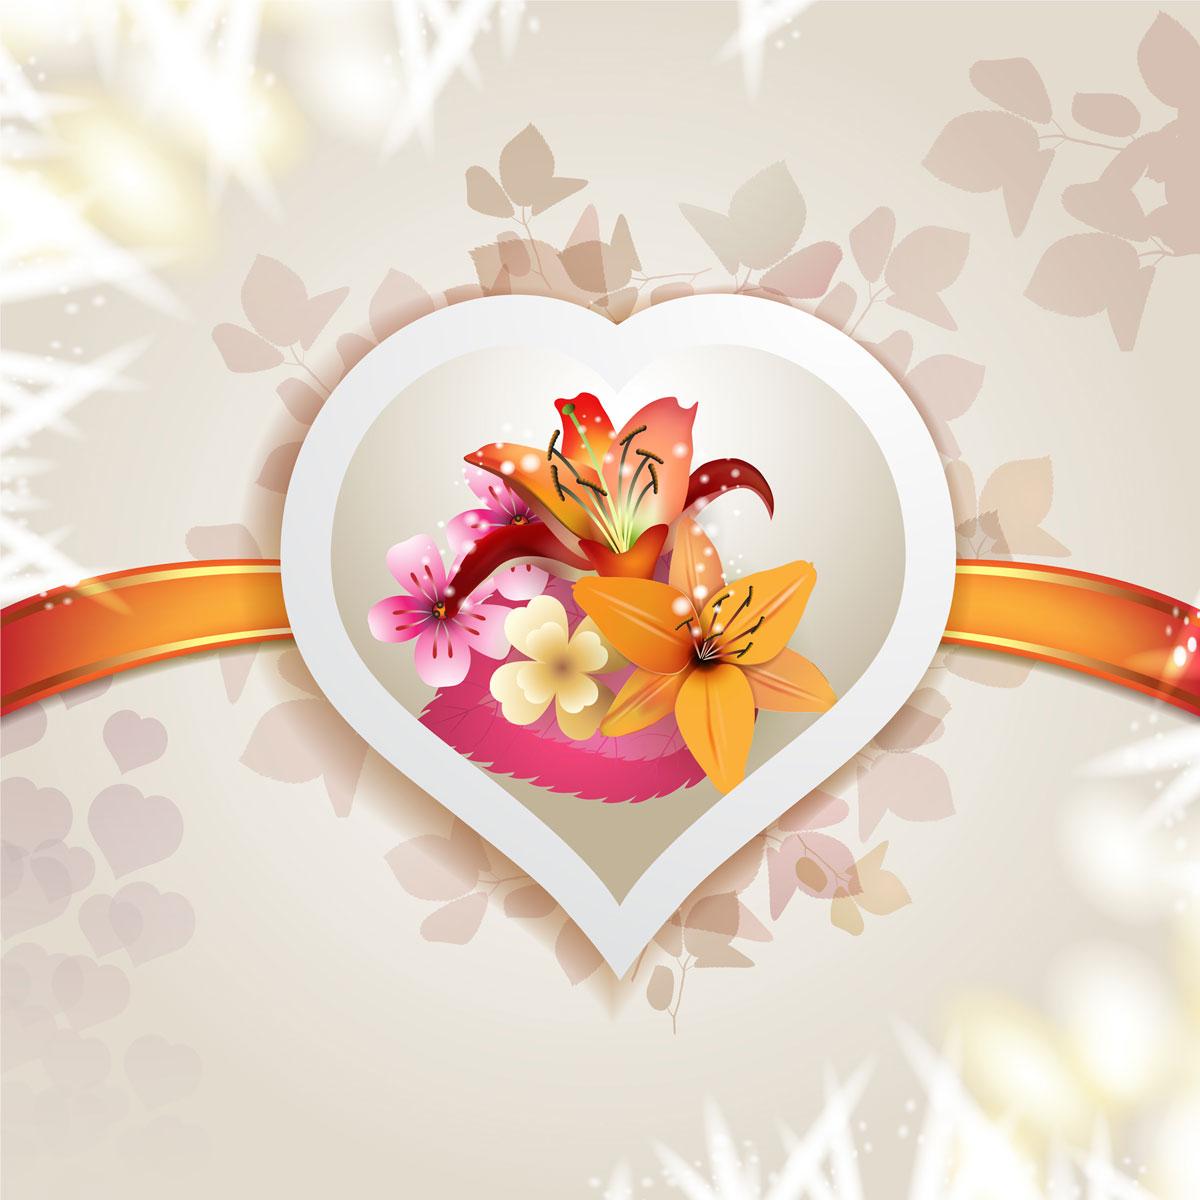 13款情人节七夕节爱心心形宣传海报设计AI矢量素材 Valentines Day Heart-shaped Vector Poster插图4